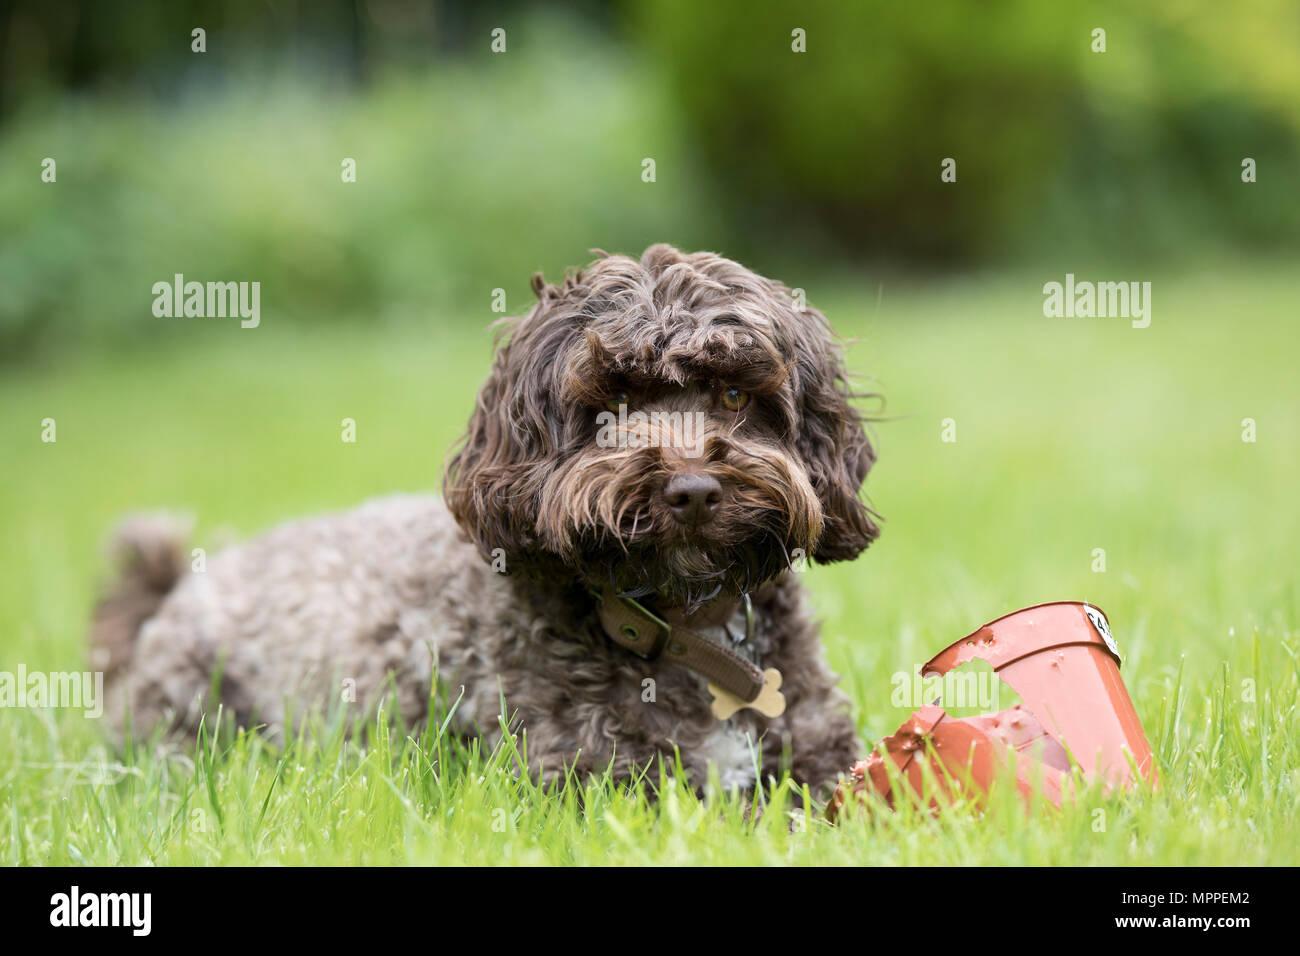 Cockerpoo dog in a garden in Surrey,UK Stock Photo